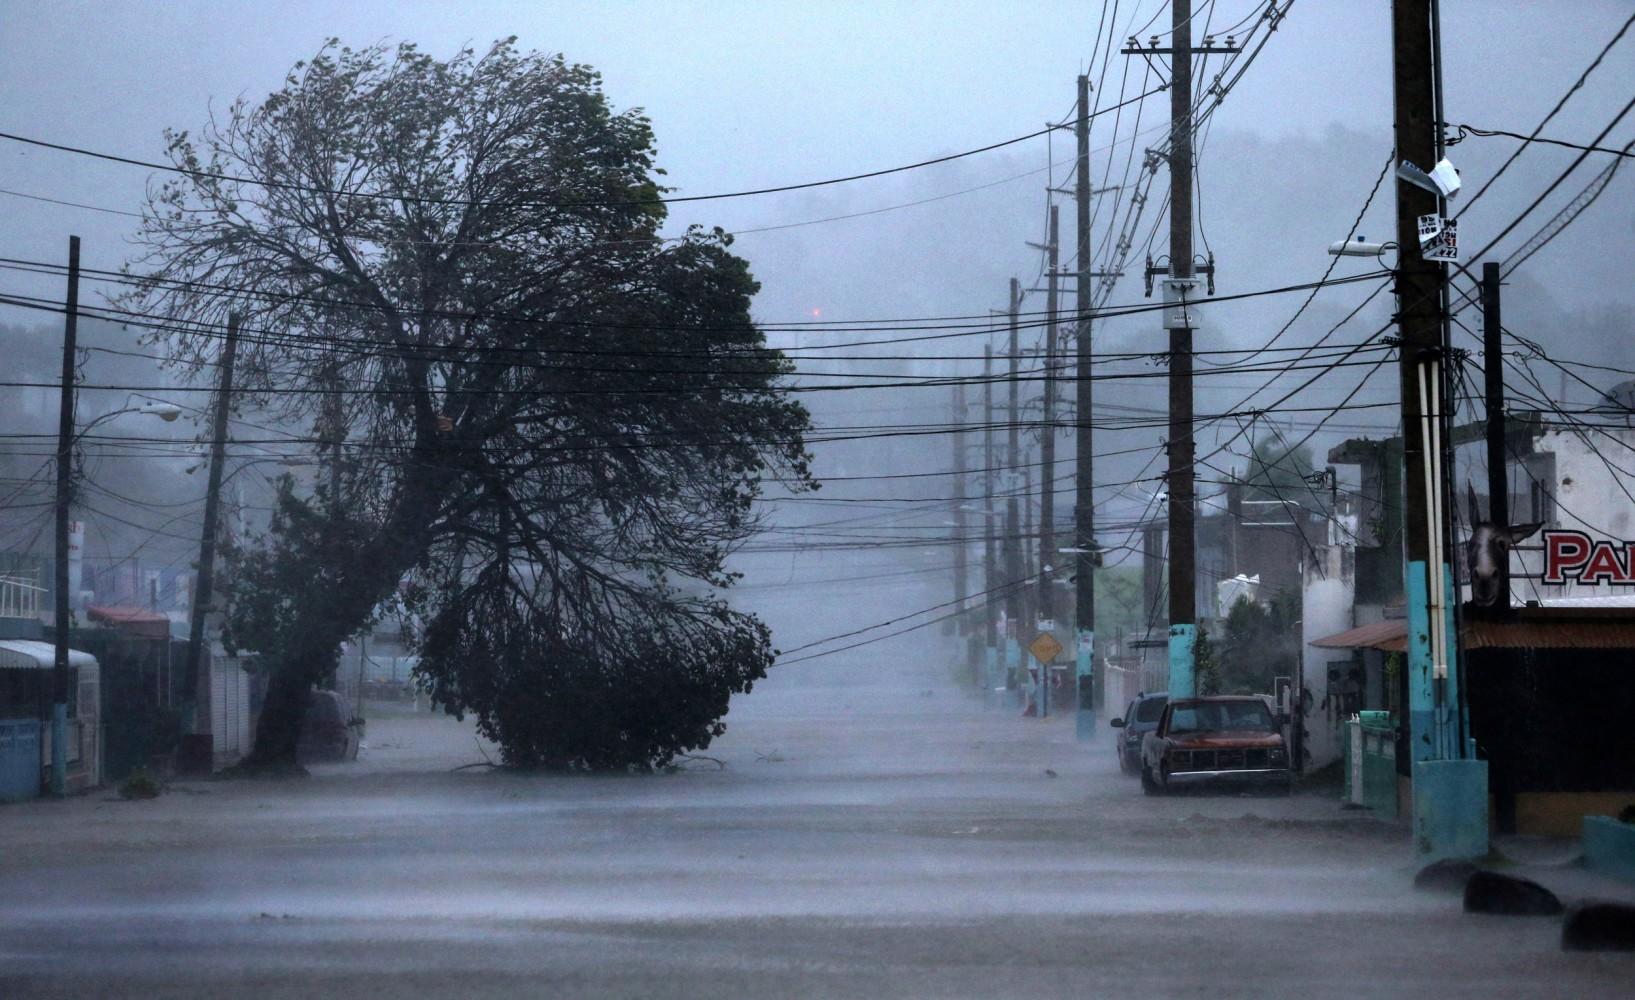 downed tree Puerto Rico hurricane